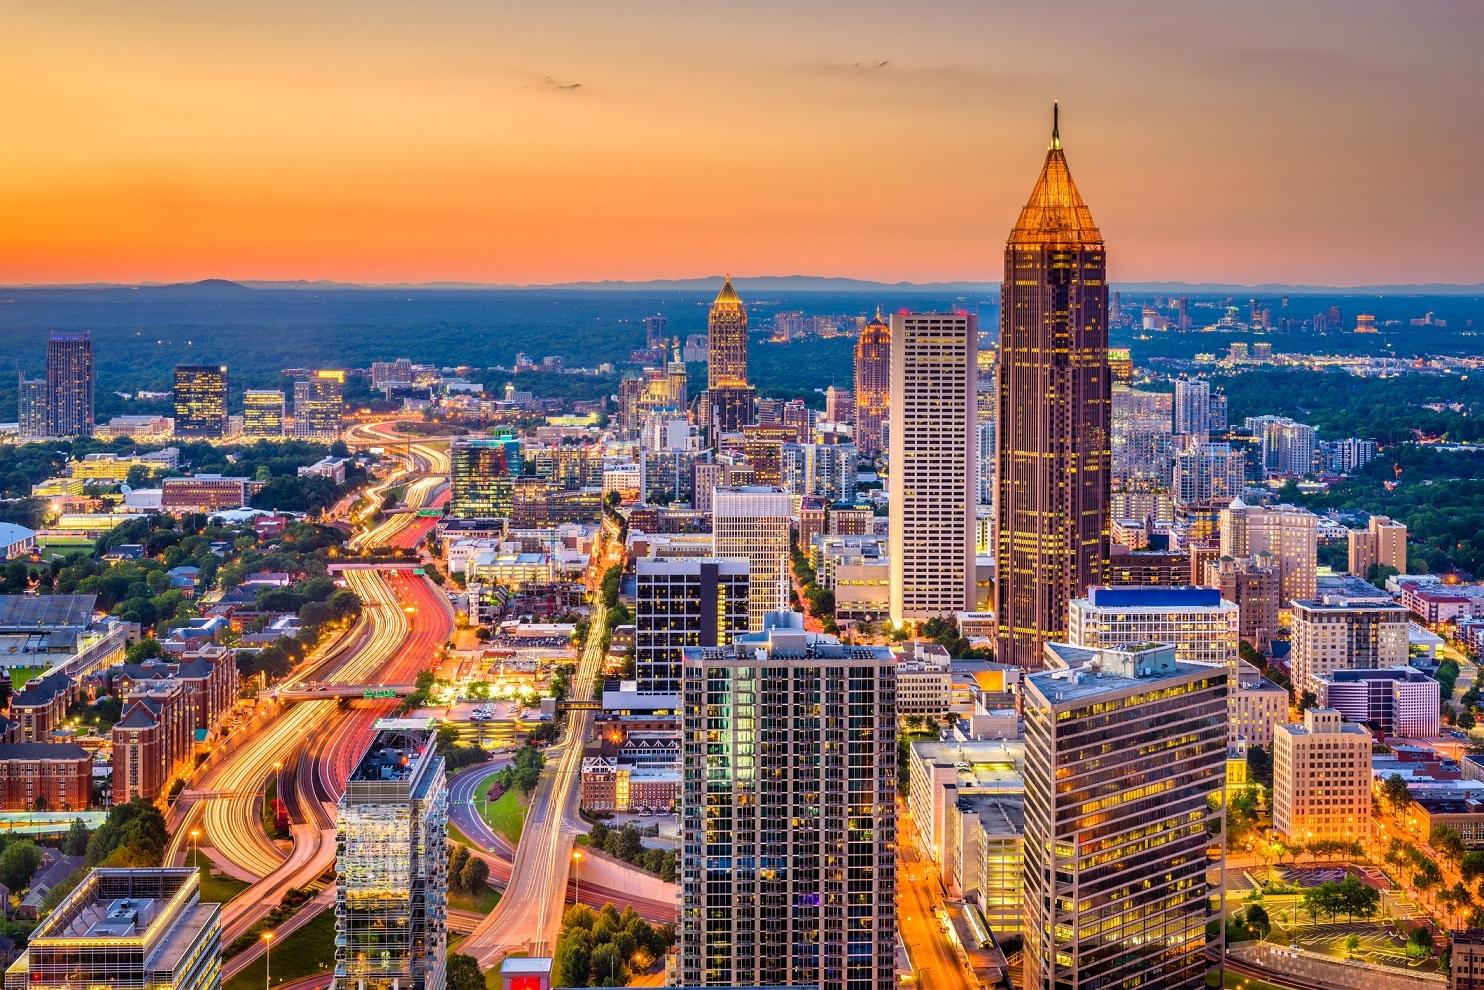 Atlanta, Georgia, USA downtown skyline at dusk.